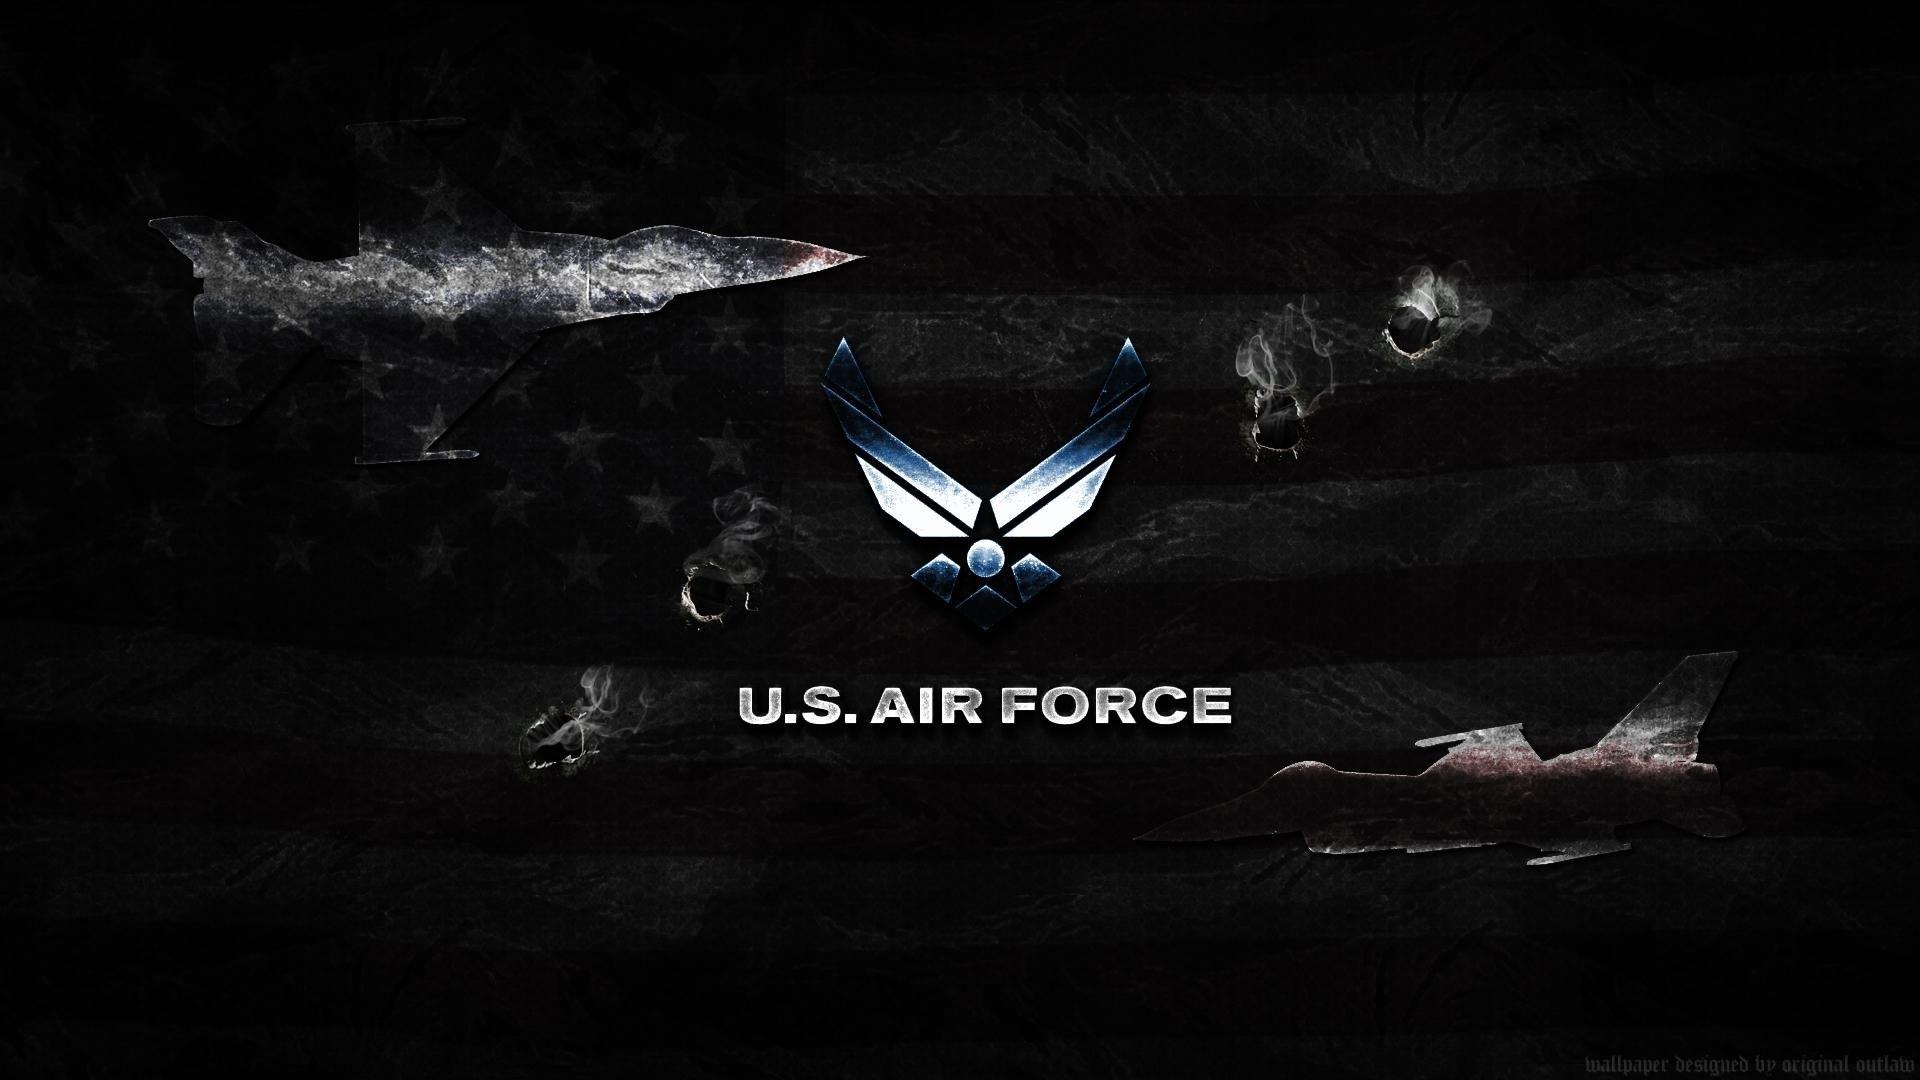 u.s.air force wallpaper   u.s.air force   pinterest   air force